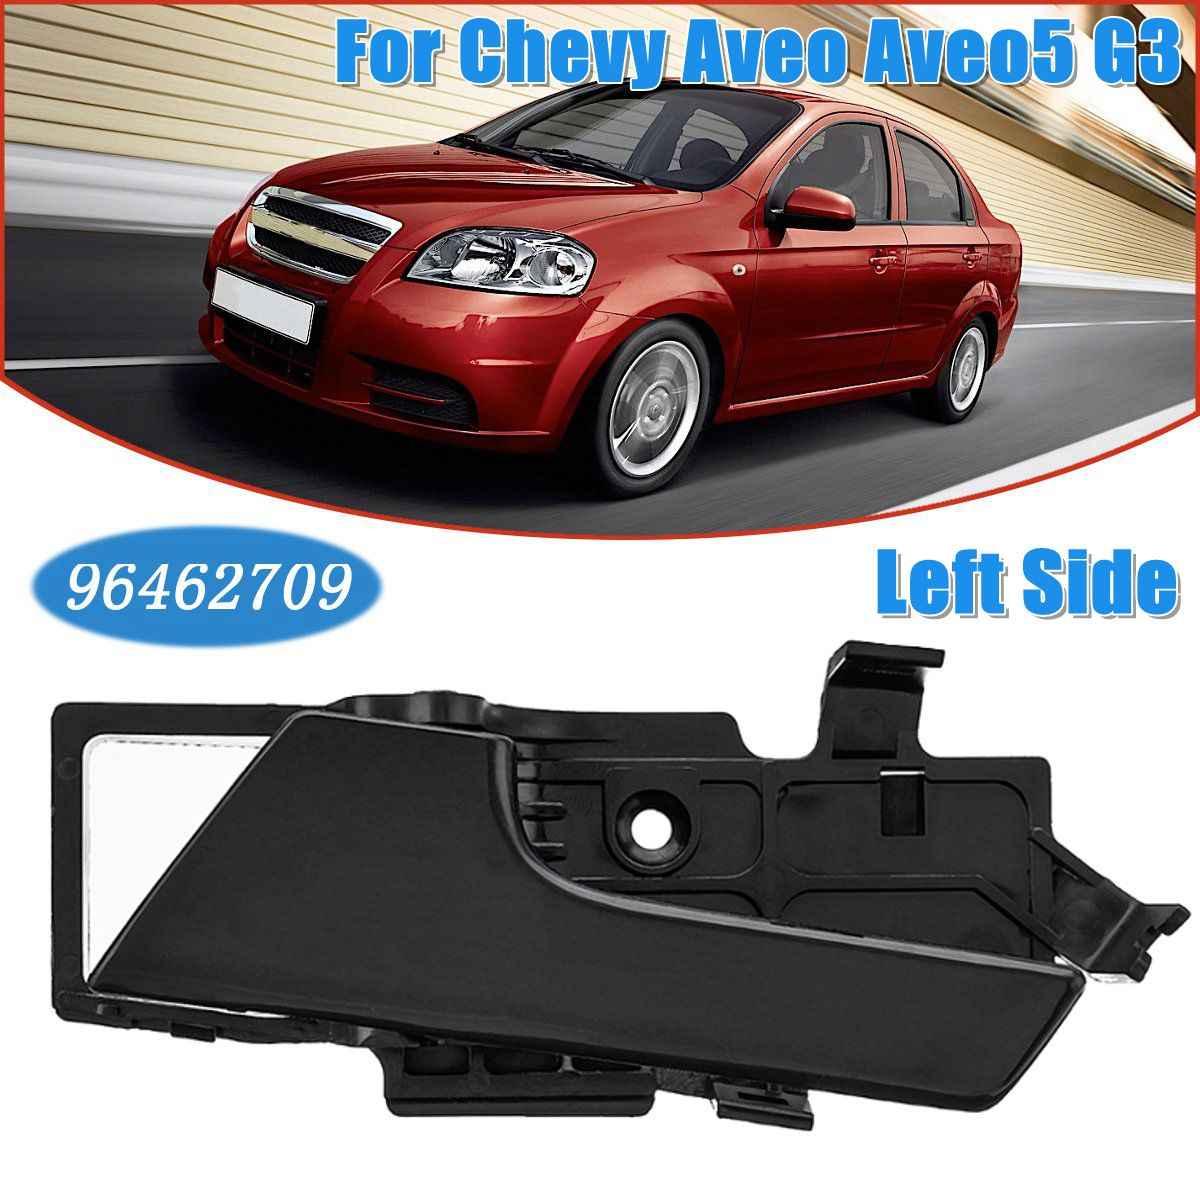 Car Left Right Interior Door Handle For Chevy Aveo Aveo5 G3 2007 2008 2009 2010 2011 96462709 96462710 Aliexpress